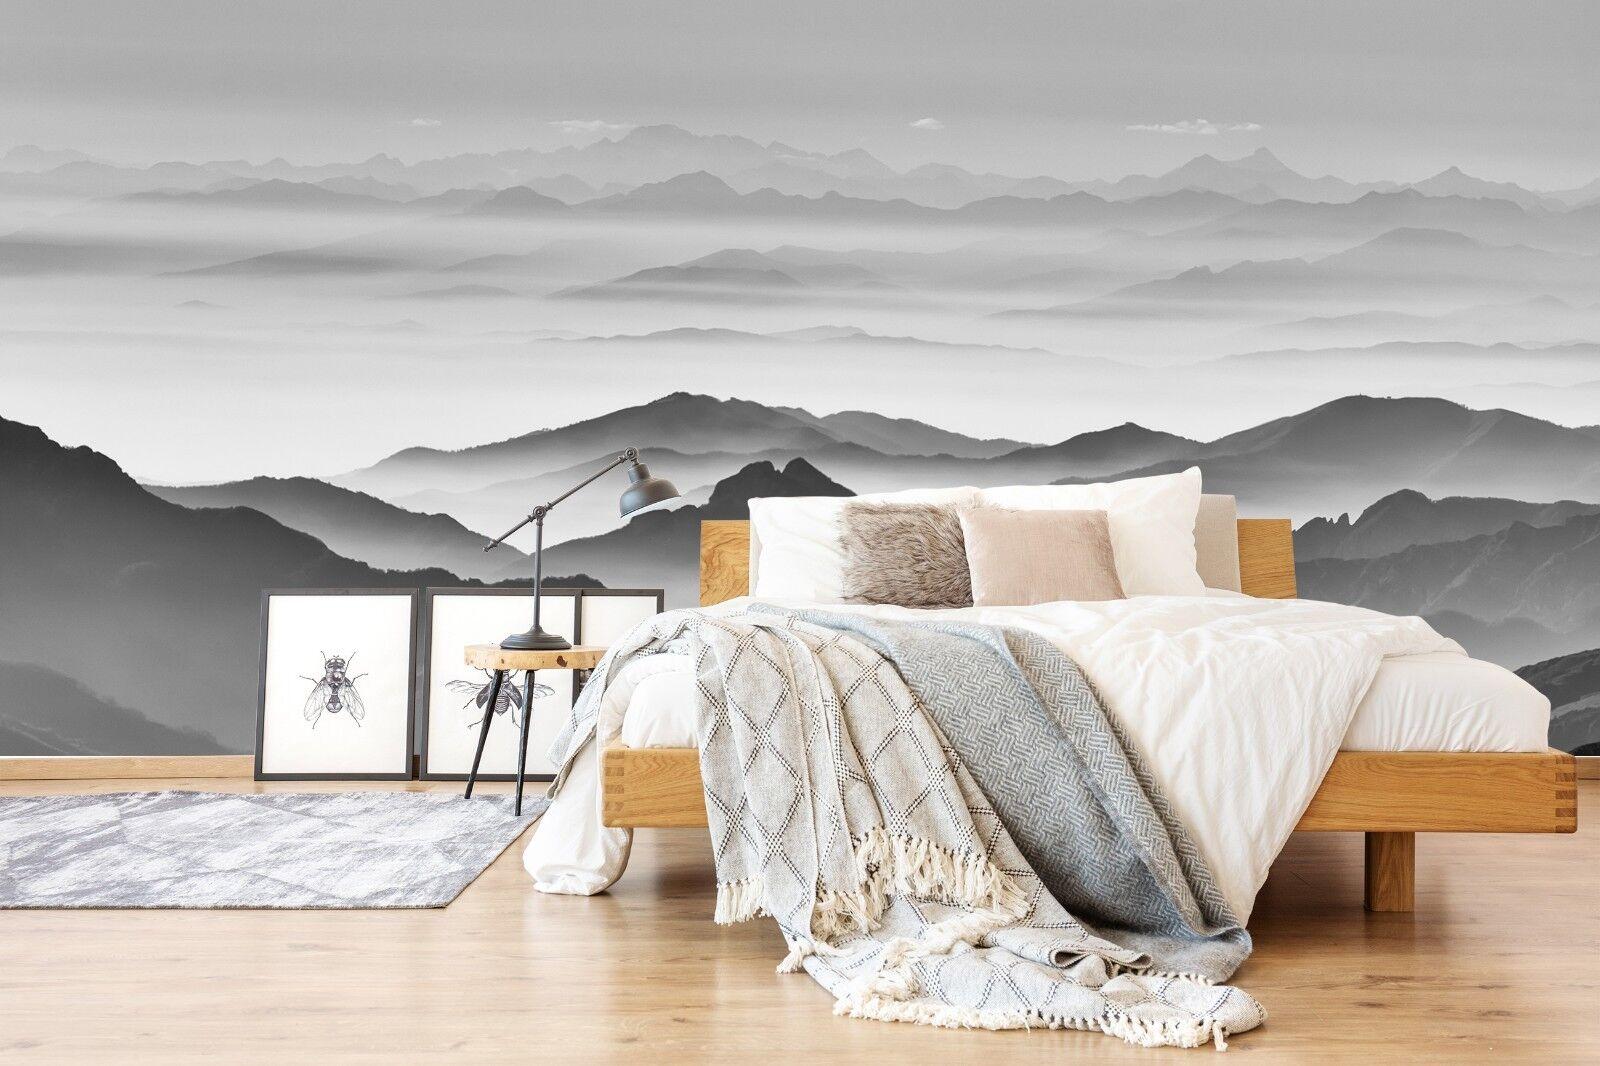 3D Sketch Mount Sky 291 Wallpaper Mural Wallpaper UK Jenny